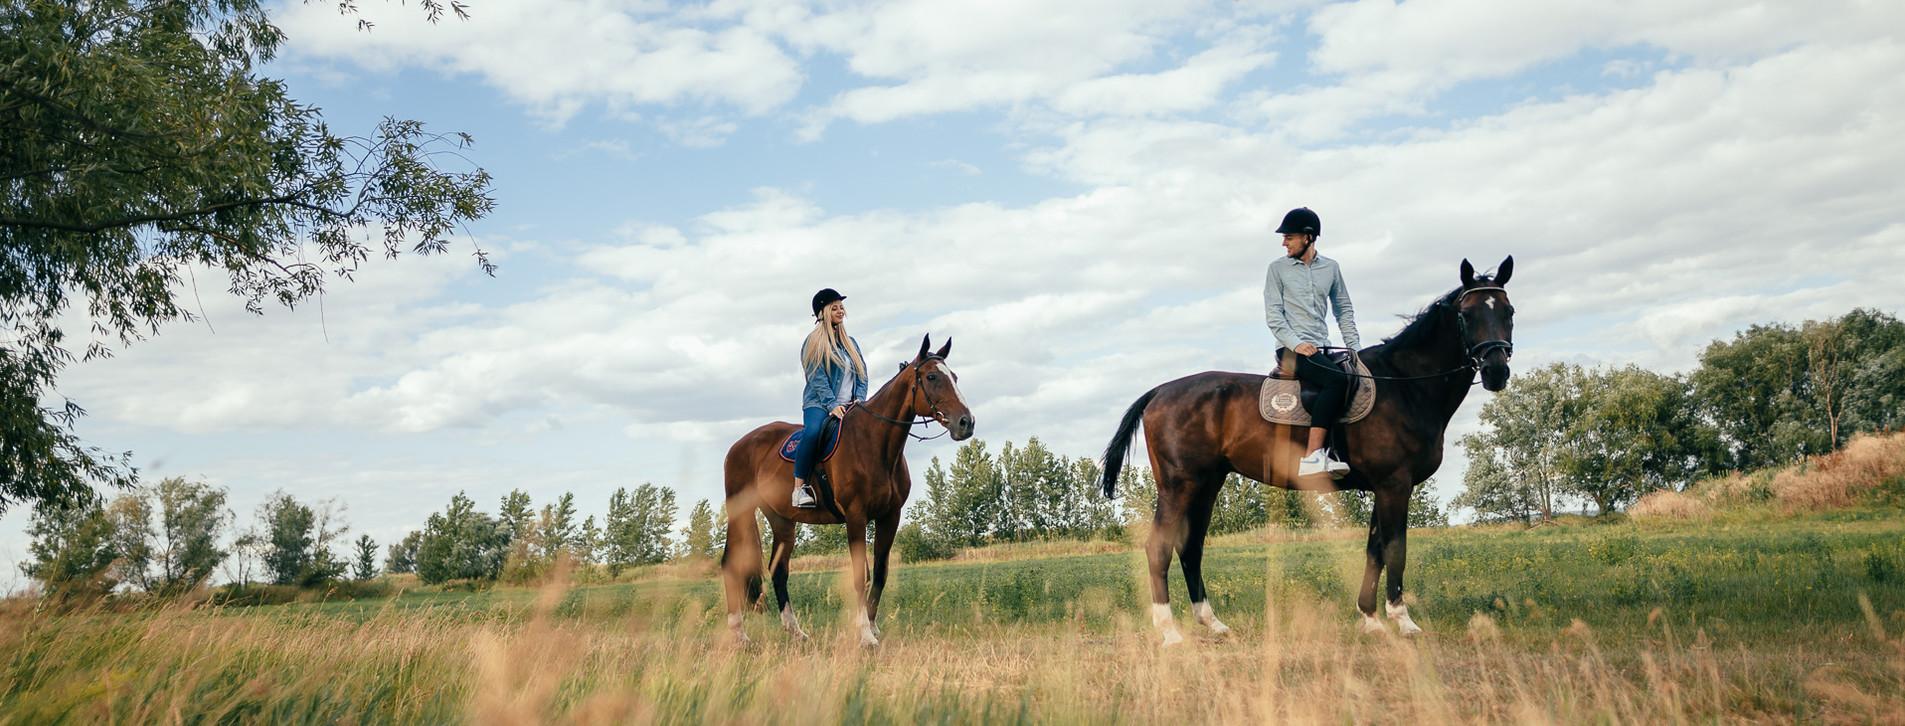 Фото - Прогулка на лошадях для двоих Long